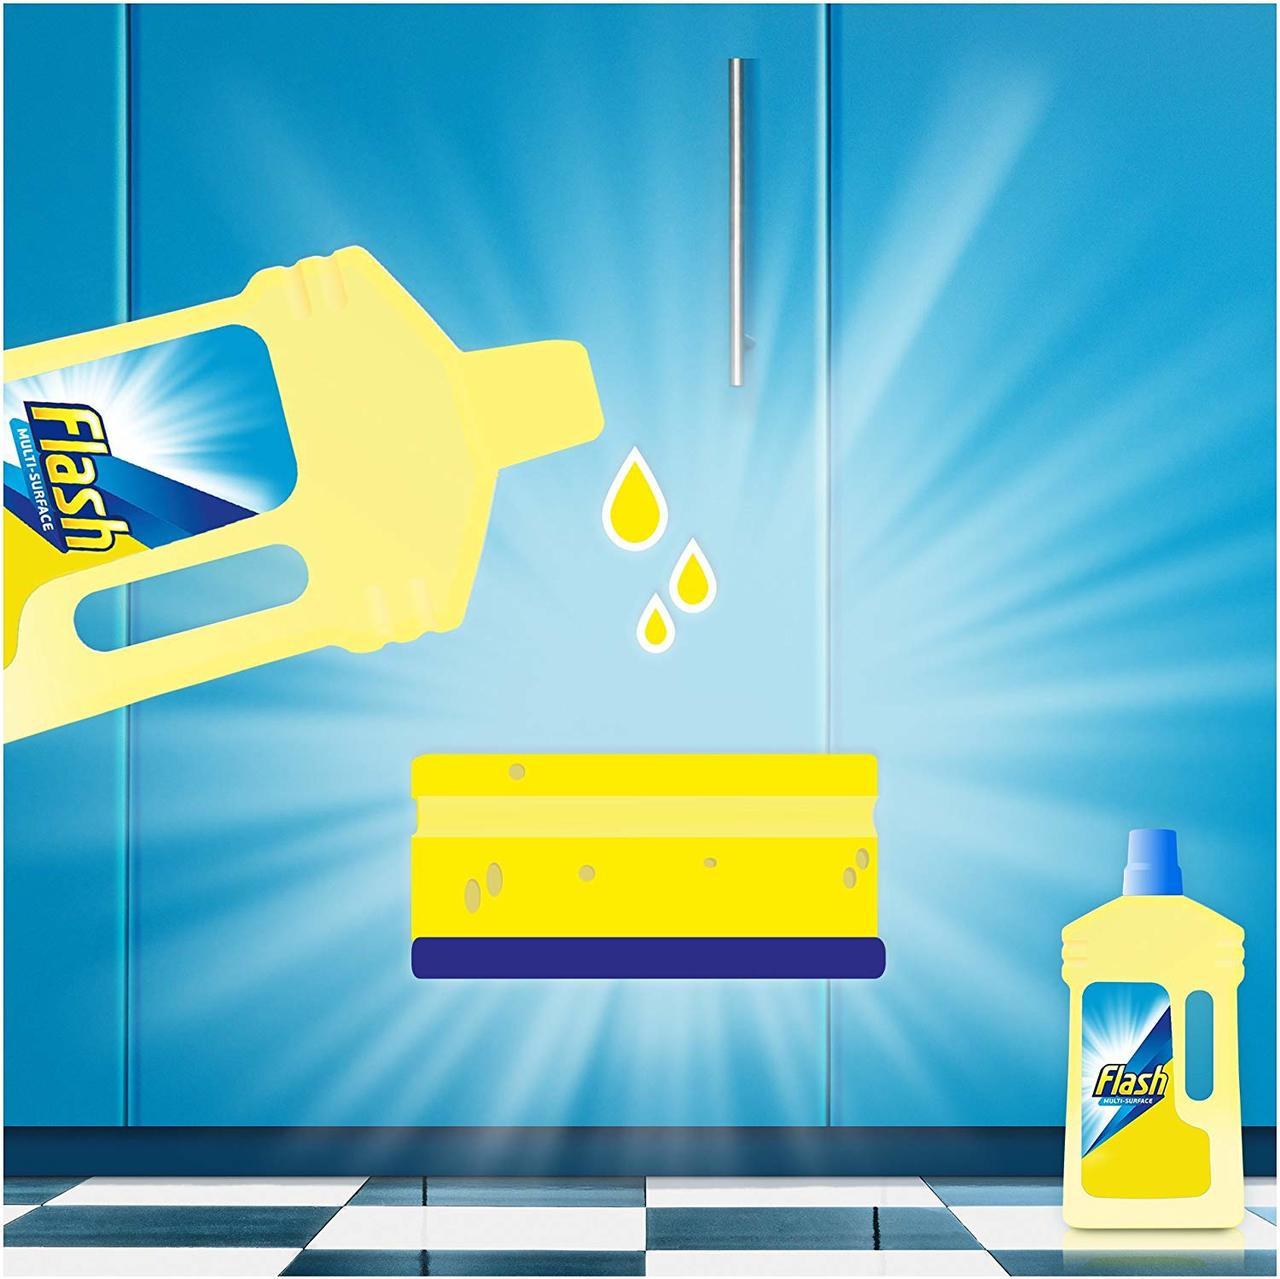 FLASH ALL PURPOSE CLEANER LIQUID  BLOSSOM & BREEZE 1.3L